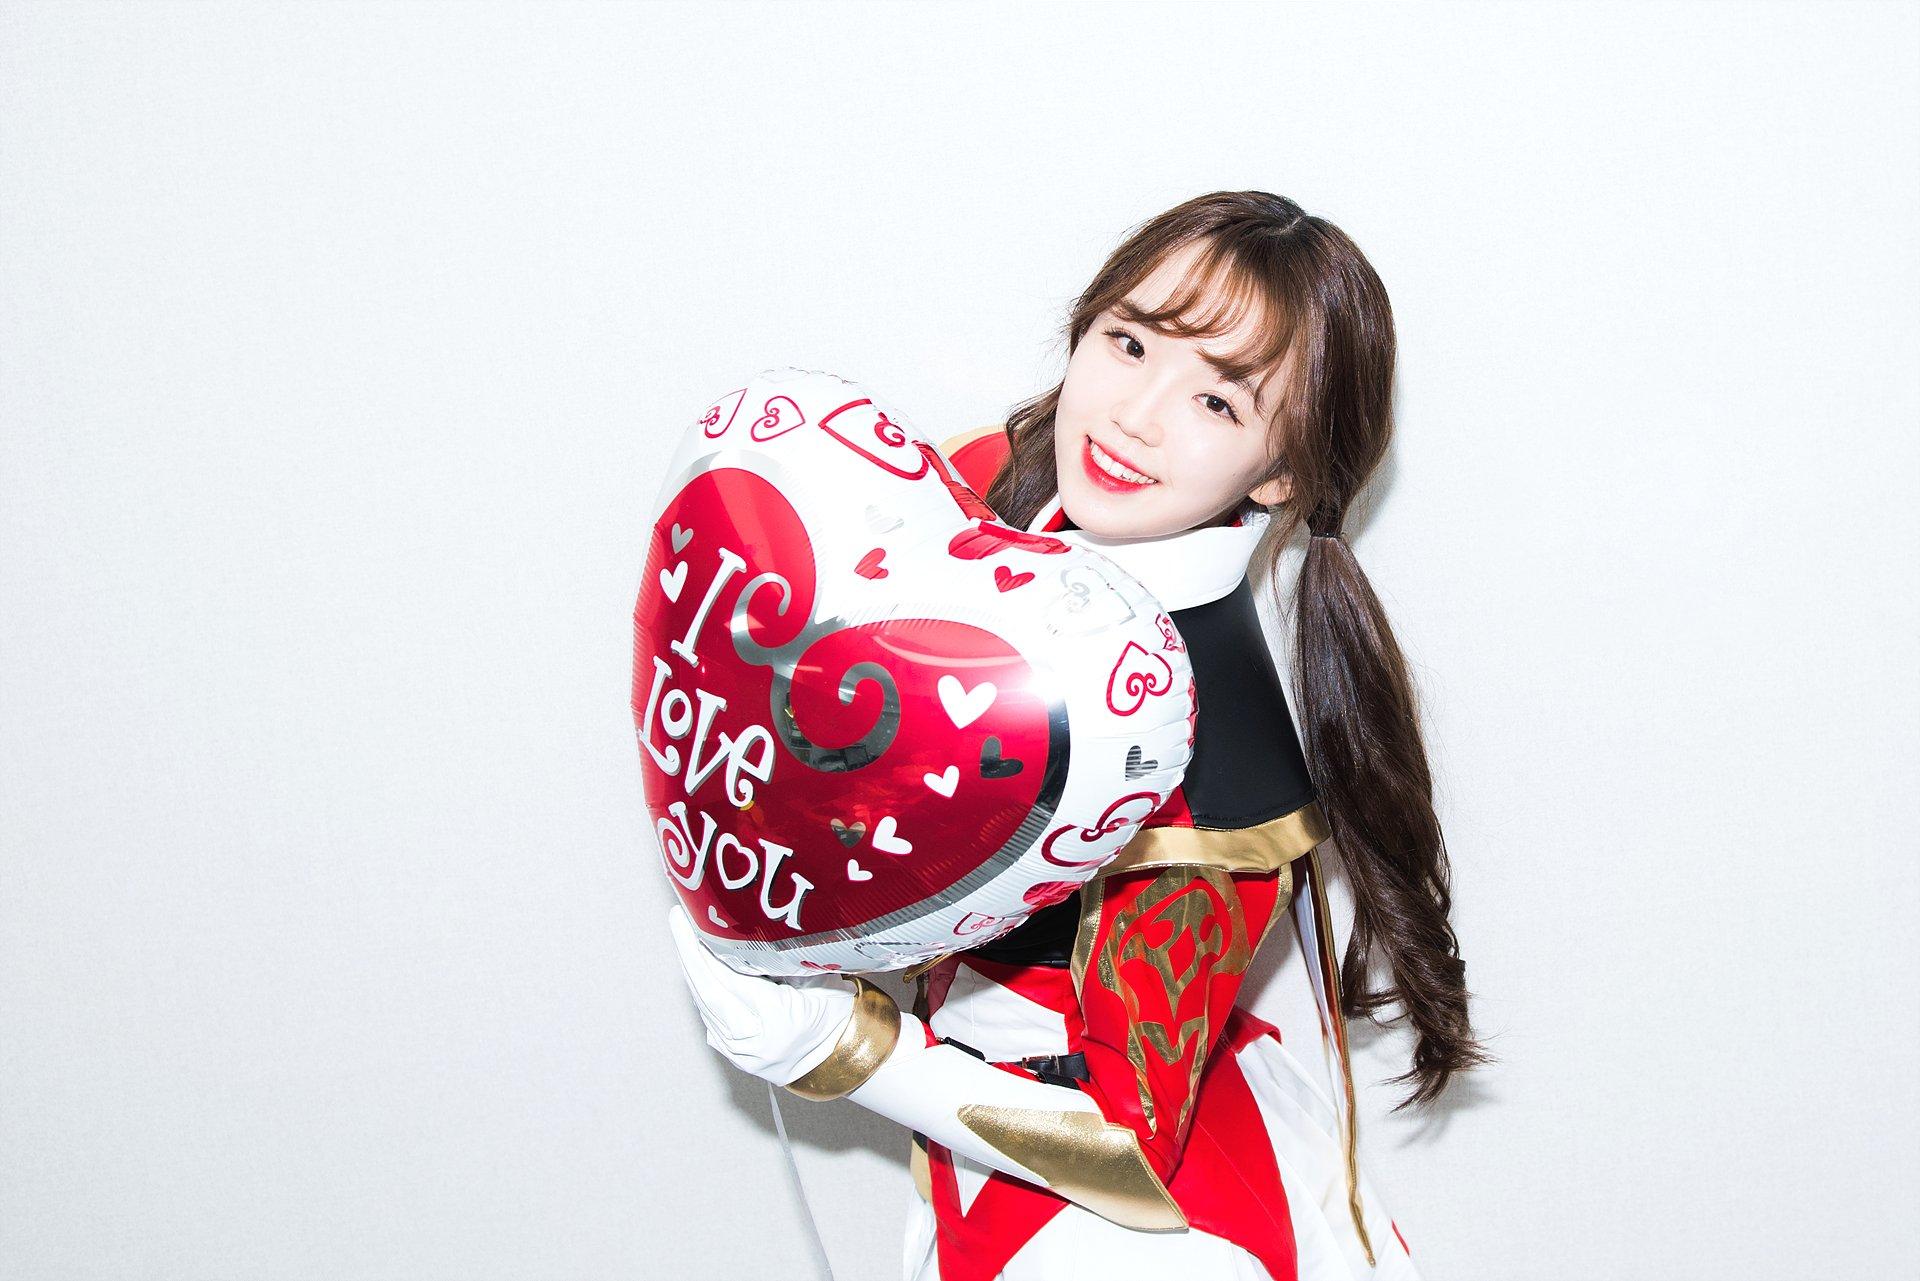 https://static.asiachan.com/Kim.Minji.%28Busters%29.full.162569.jpg